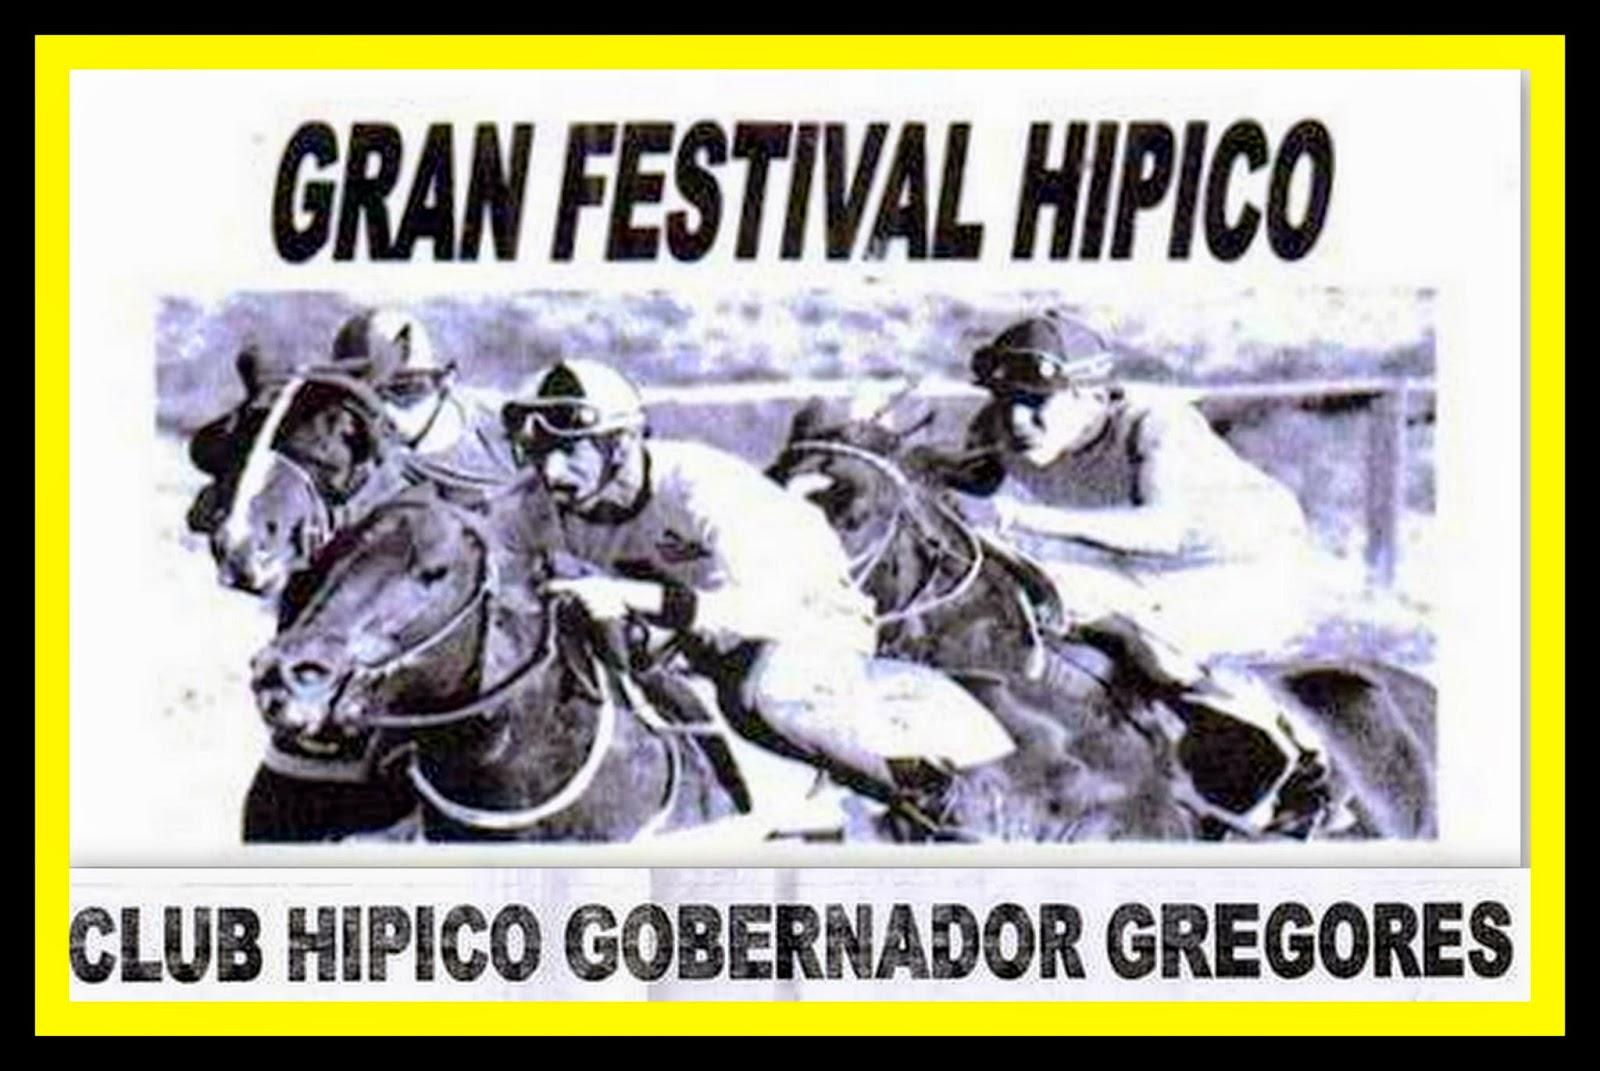 http://turfdelapatagonia.blogspot.com.ar/2014/10/0510-programa-de-carreras-de-caballos.html